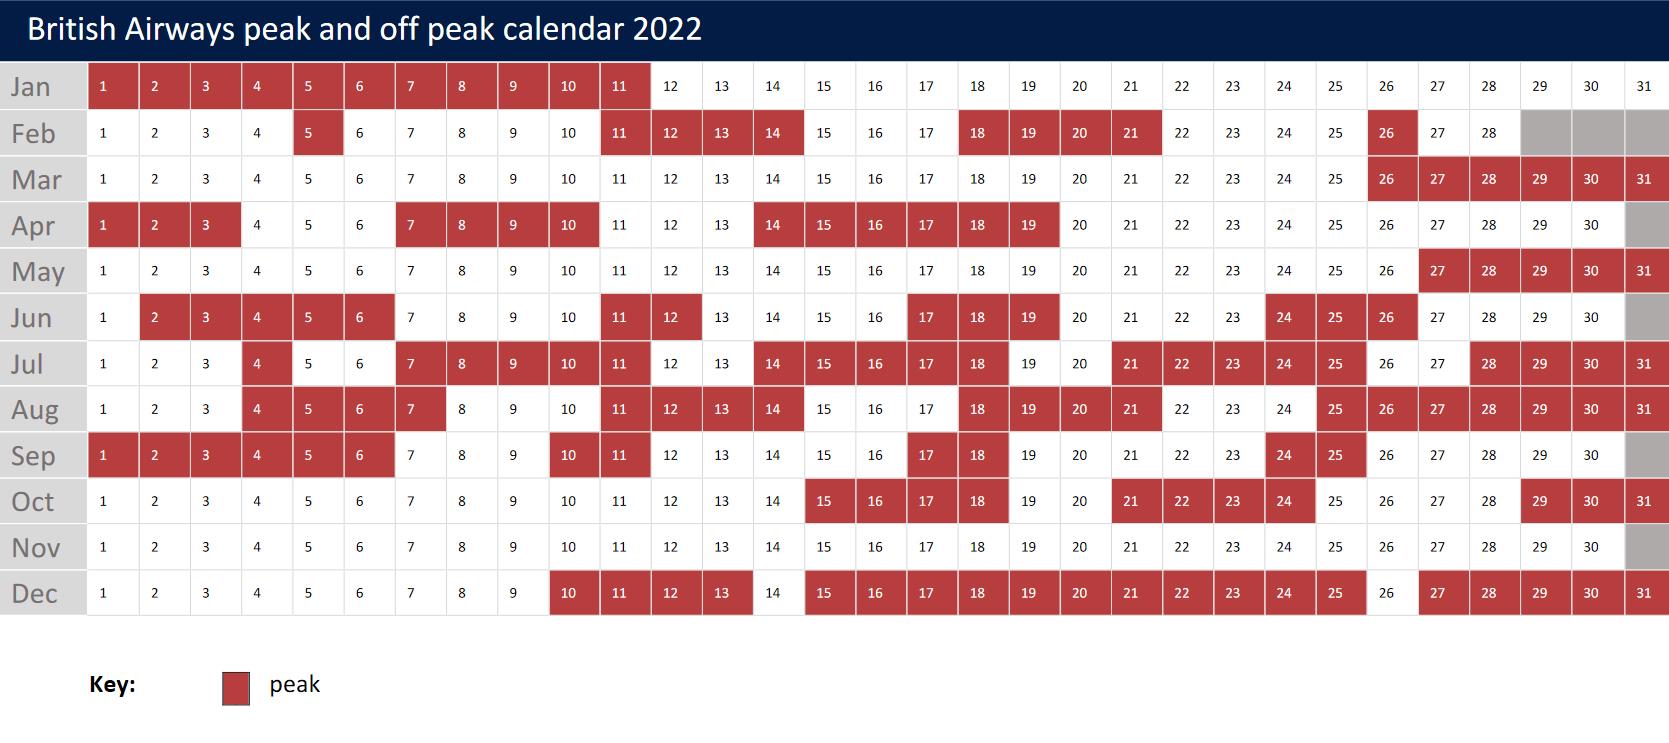 British Airways peak off peak Avios redemption calendar 2022